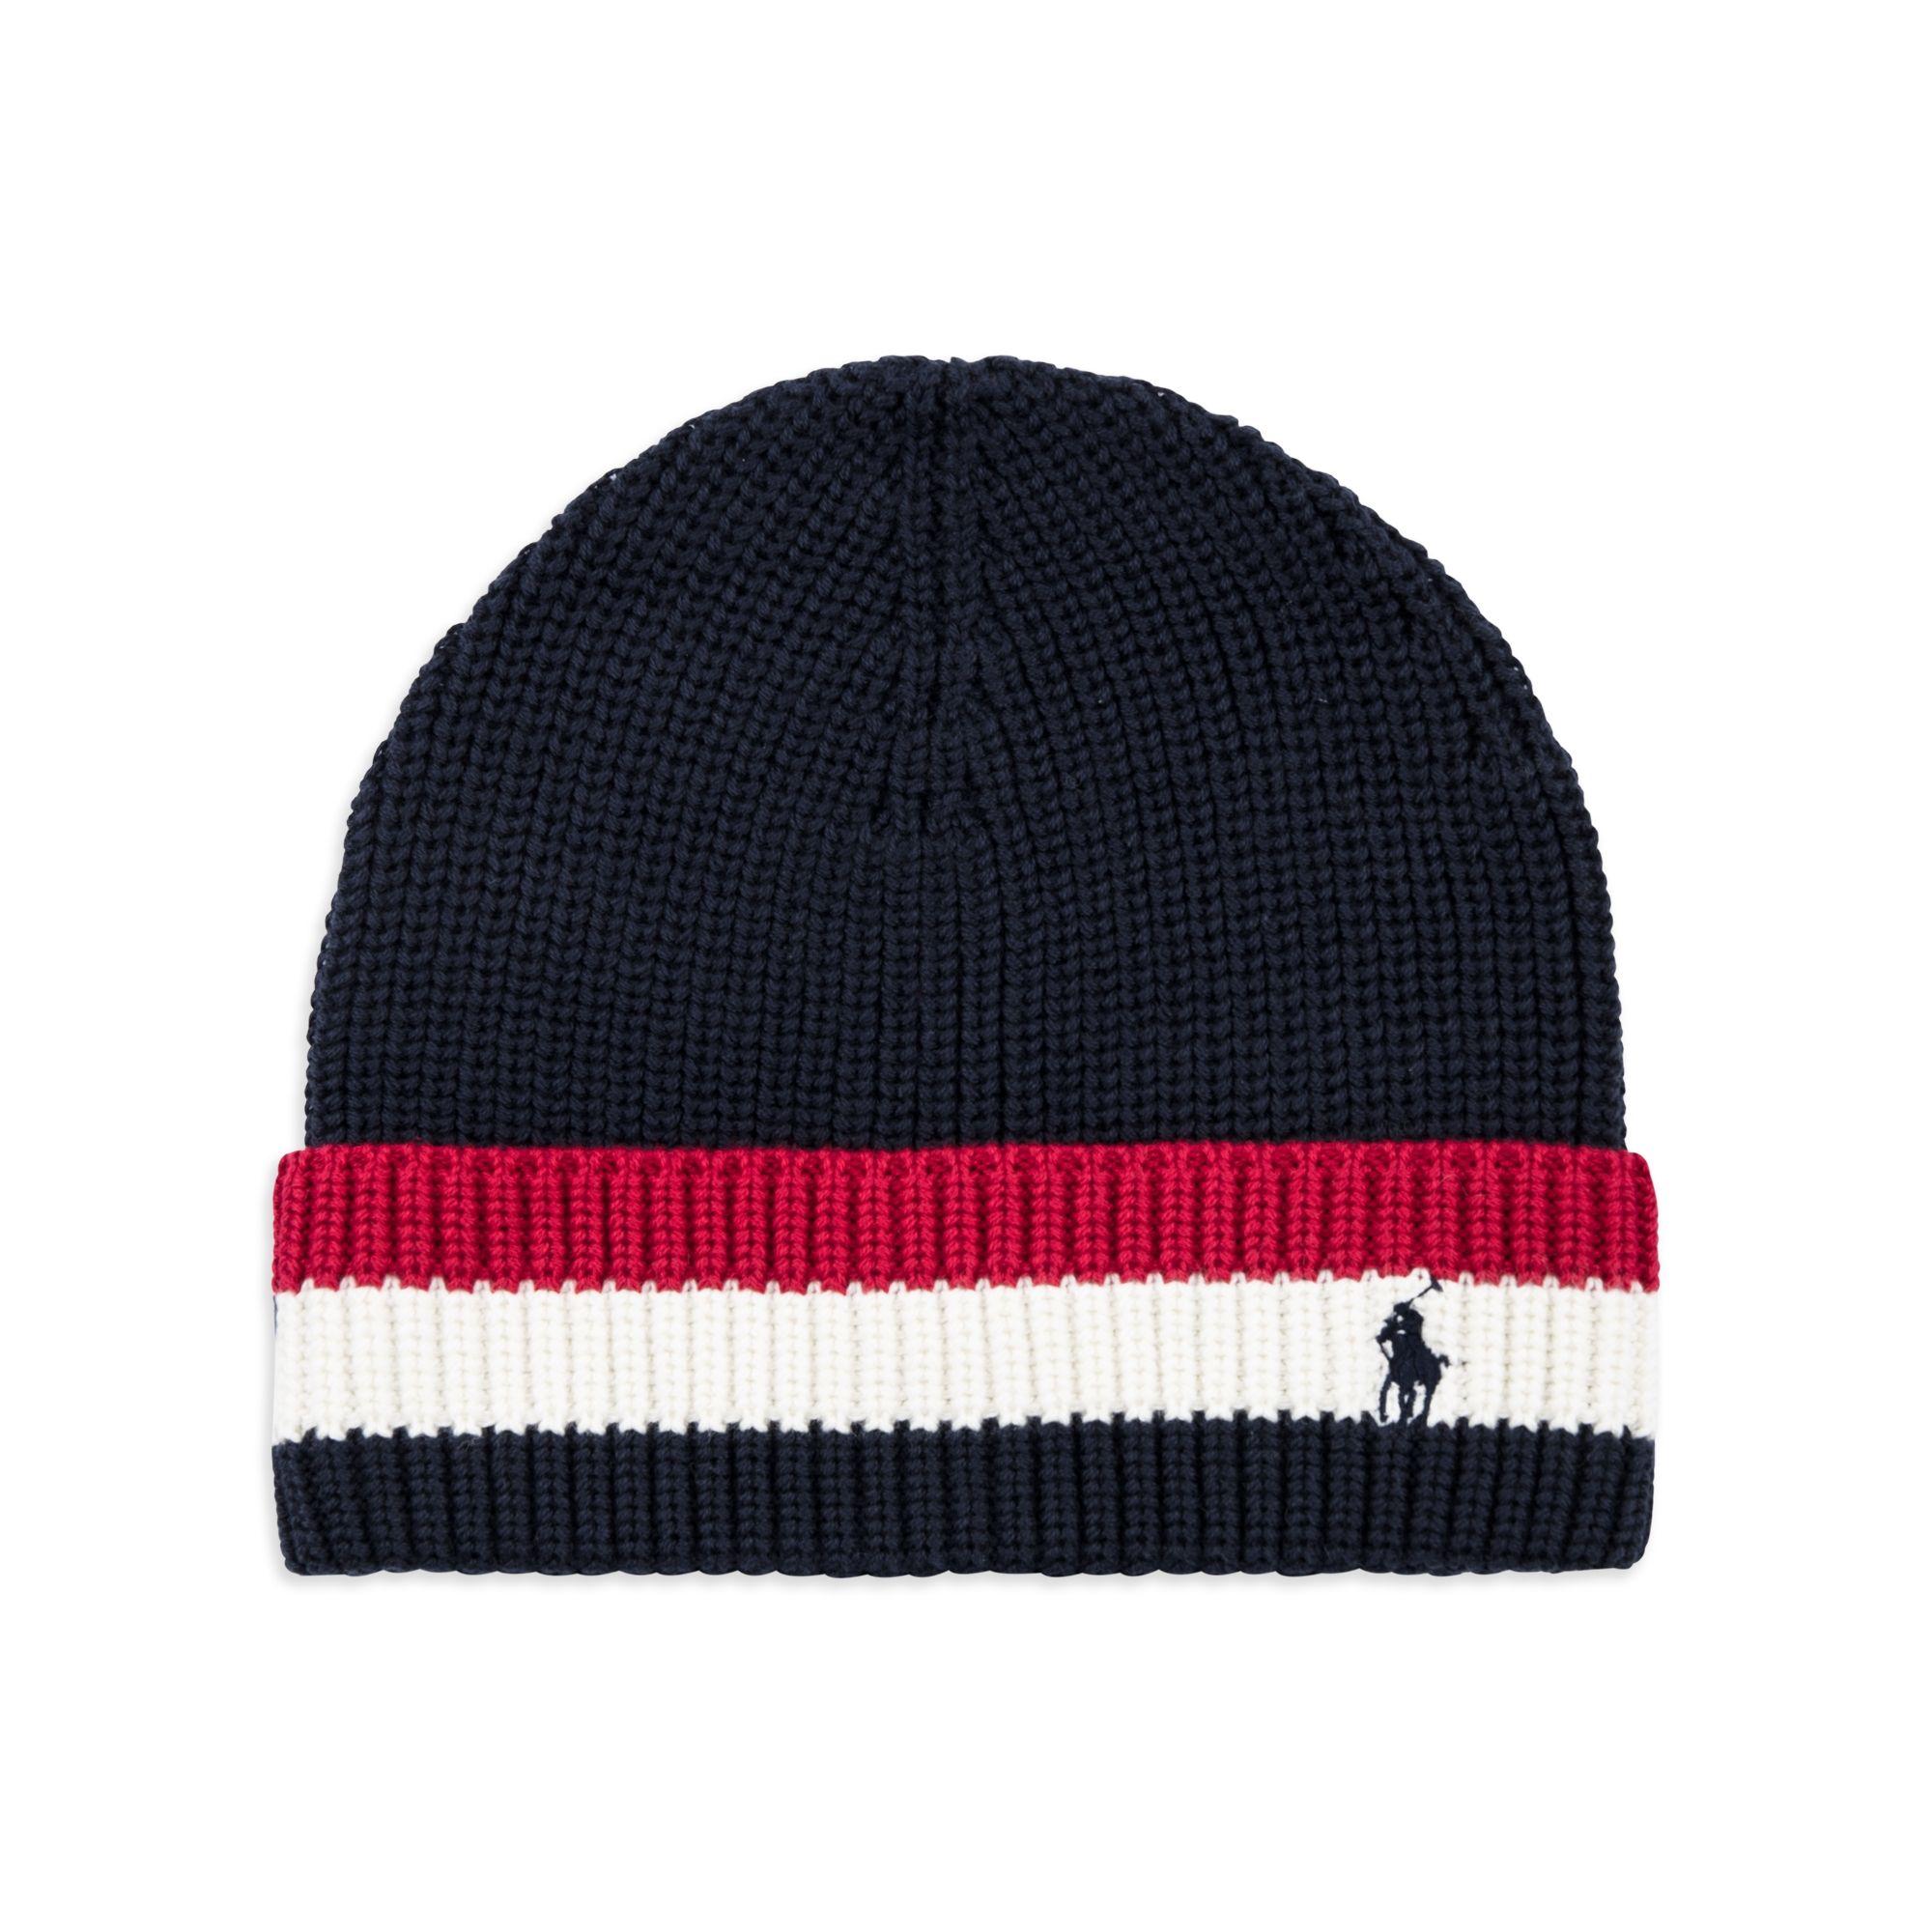 6522fe2e4f7 RALPH LAUREN Boys Striped Brim Cotton Hat - Navy Boys beanie hat • Soft  combed cotton • Turn up striped brim • Pony logo embroideryMaterial  100%  Cotton